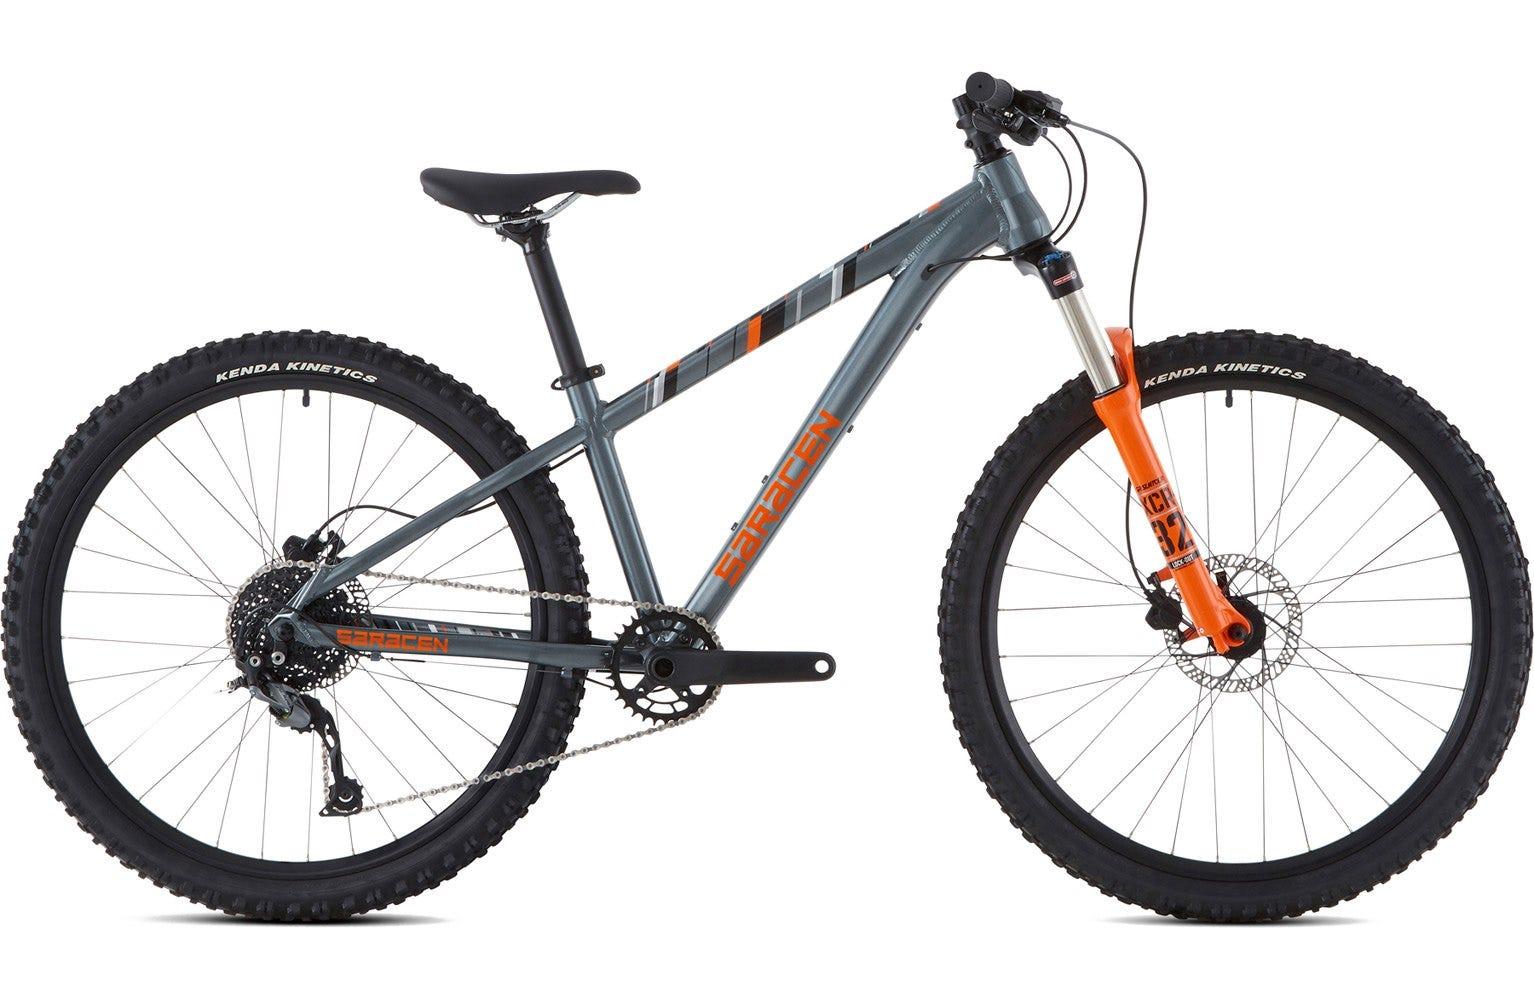 Saracen Mantra 2.6 inch bike